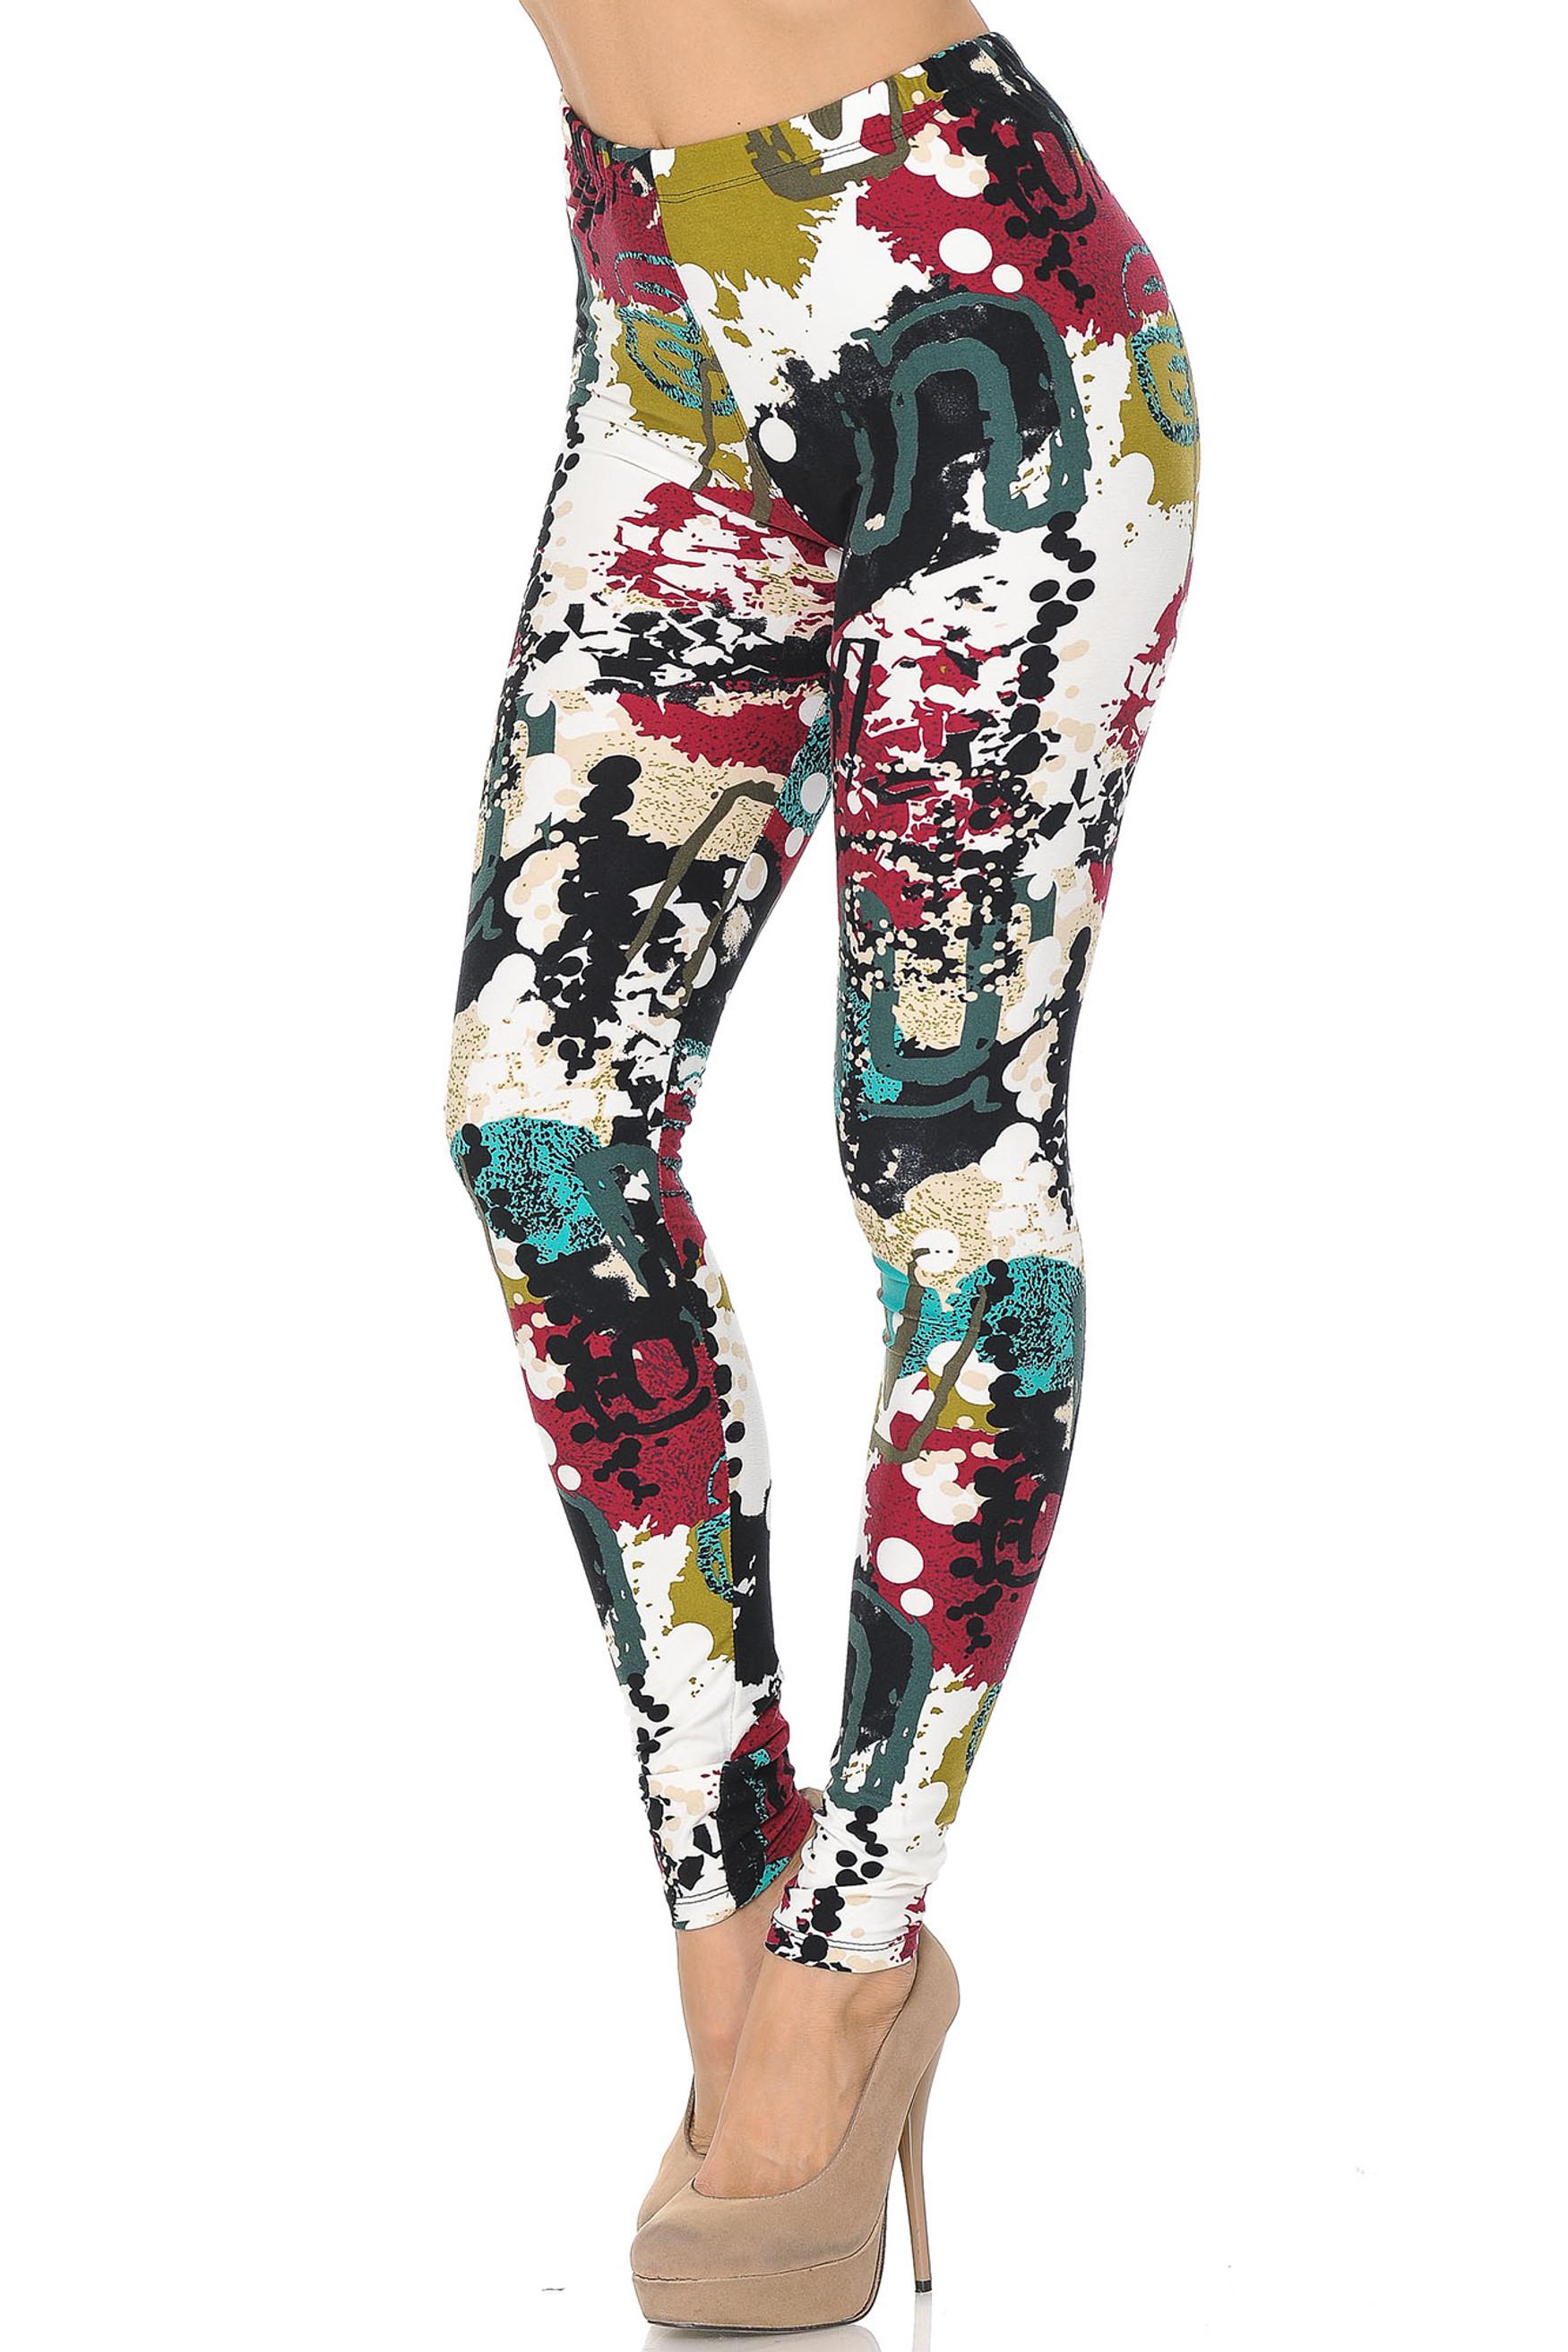 Soft Brushed Summer Picasso Leggings